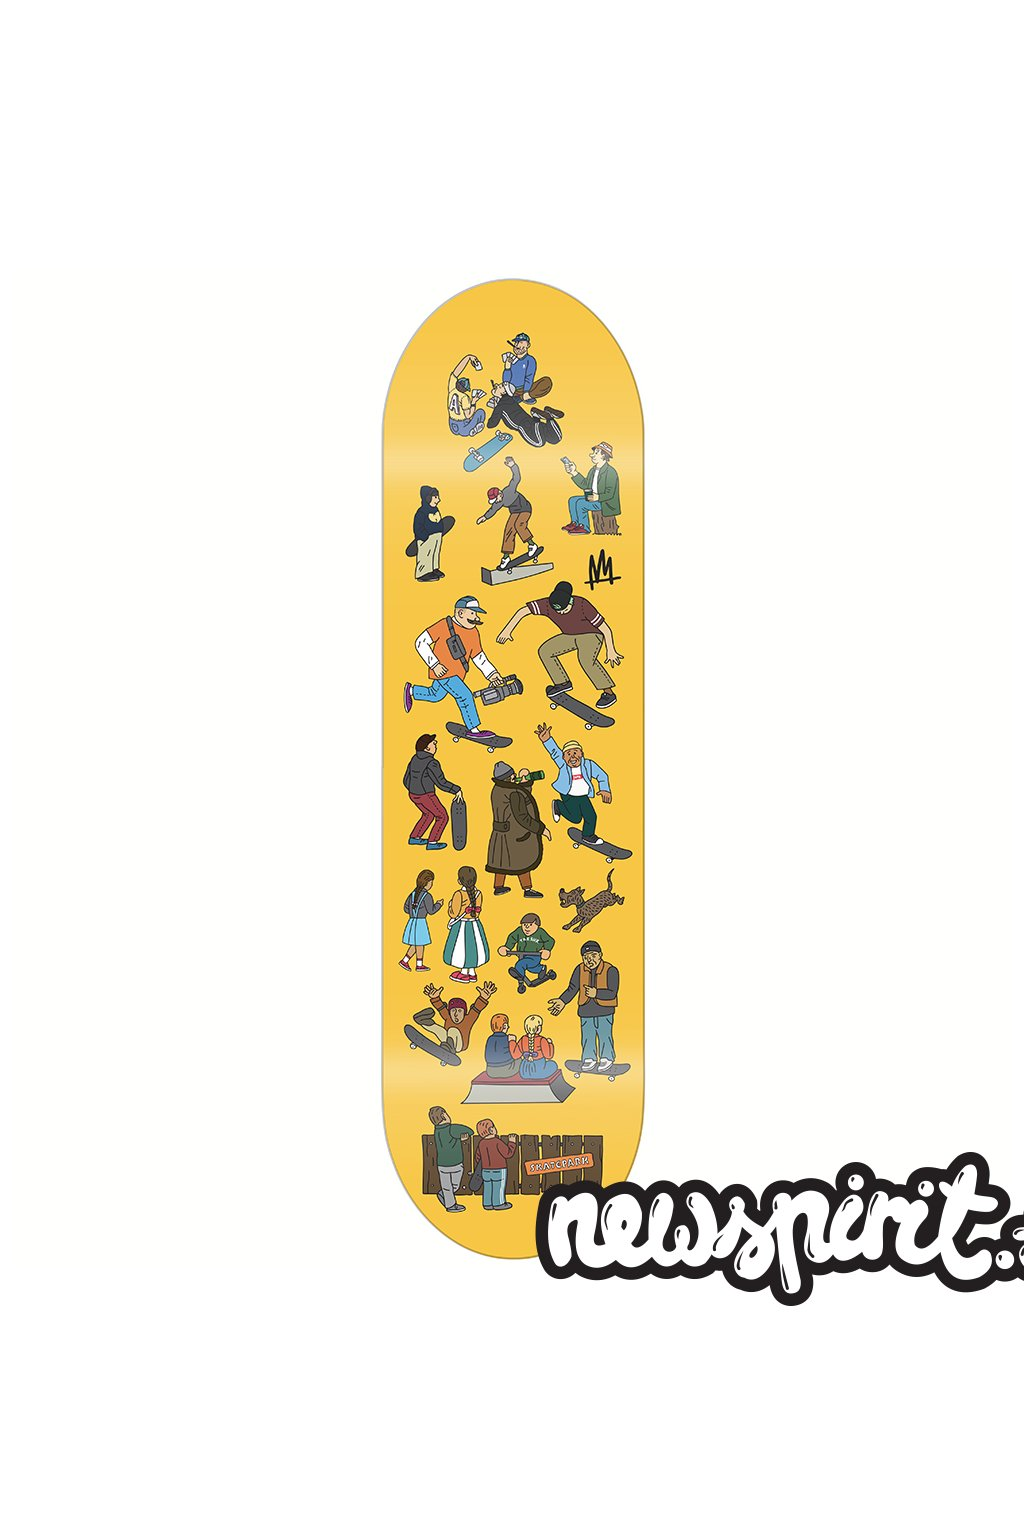 ambassadors skatepark 1000x1000 1000x1000